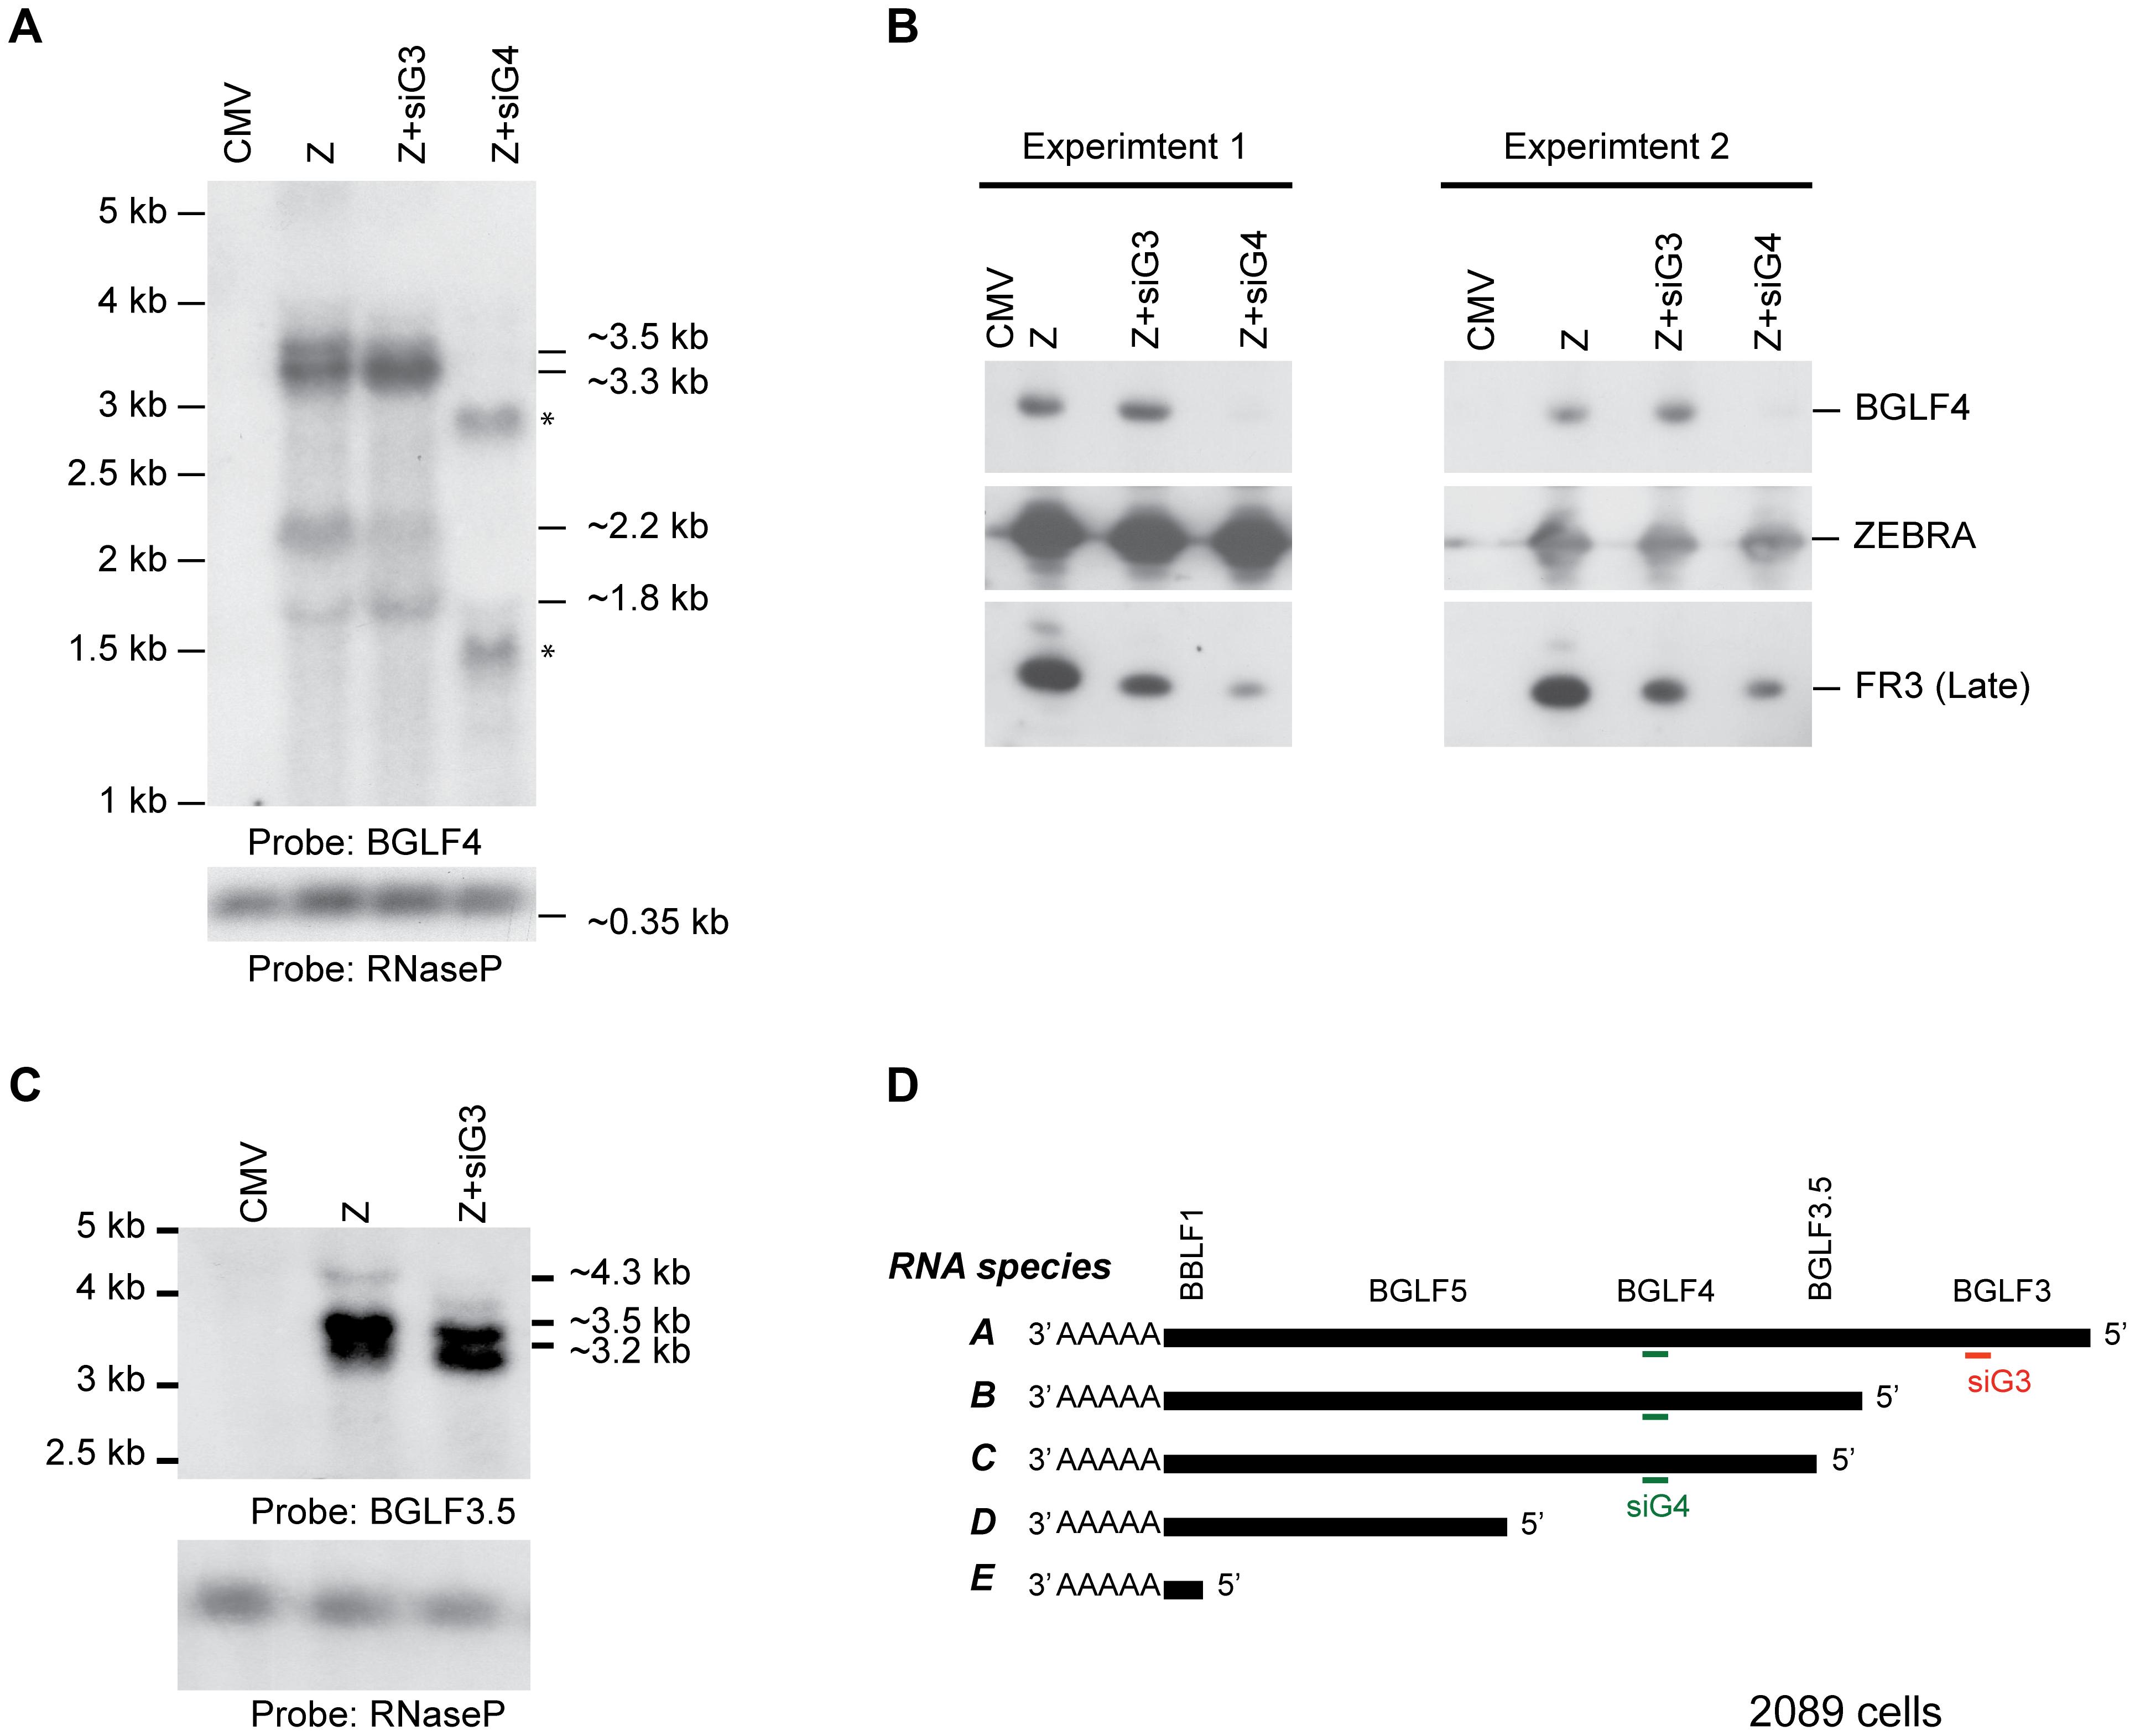 Knockdown of BGLF3 has no effect on expression of BGLF4.